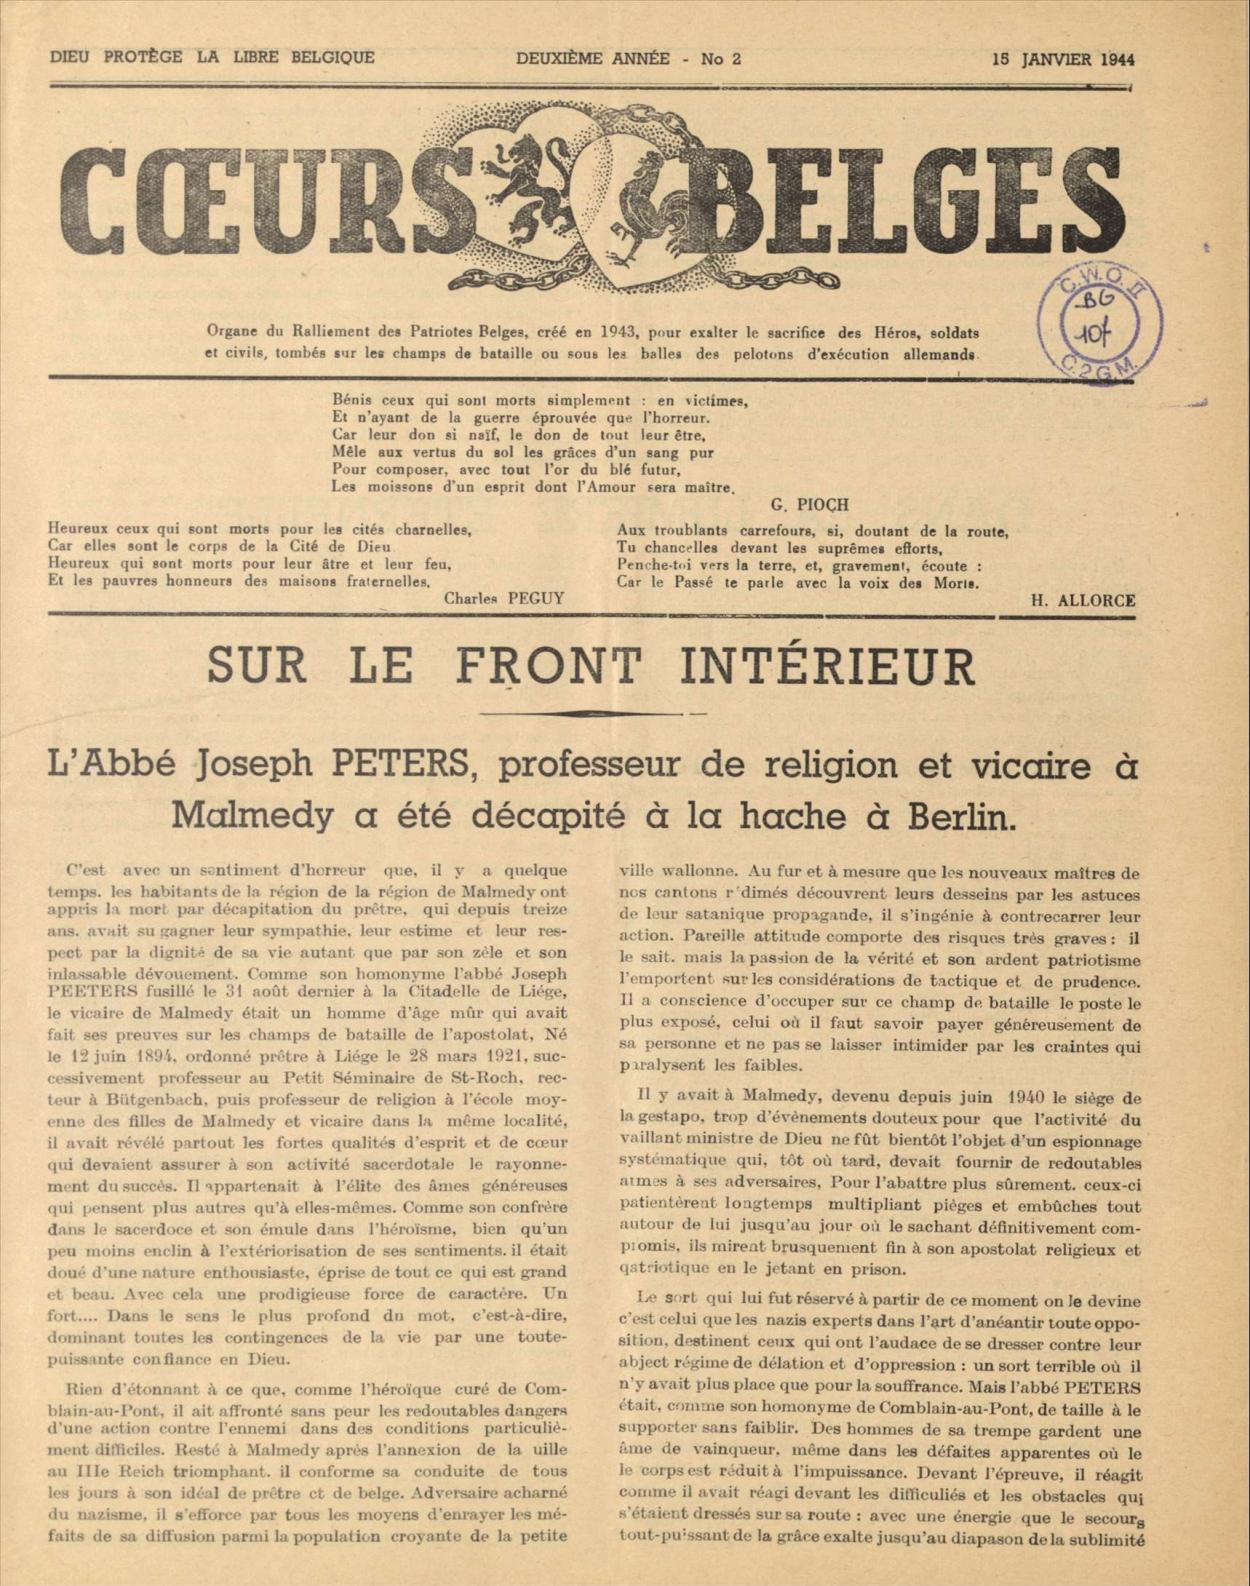 soma_bg107_1944-01-15_01_005-00001-coeurs-belges-1-5-1944.jpg